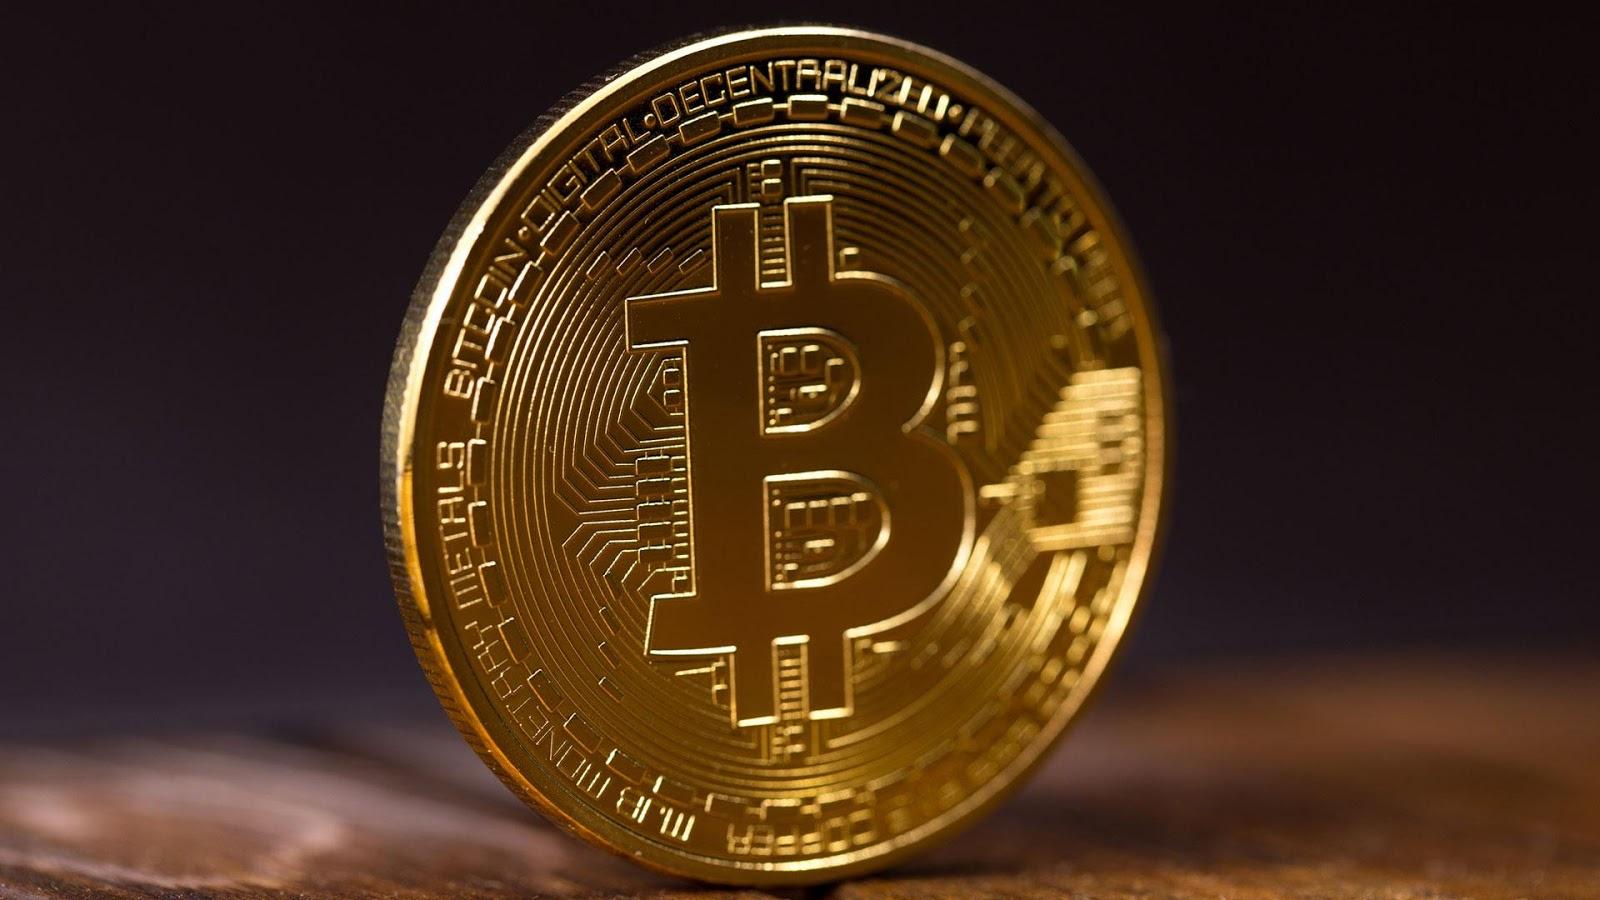 Bitcoin Computer HD Wallpaper 62351 1600x900px 1600x900